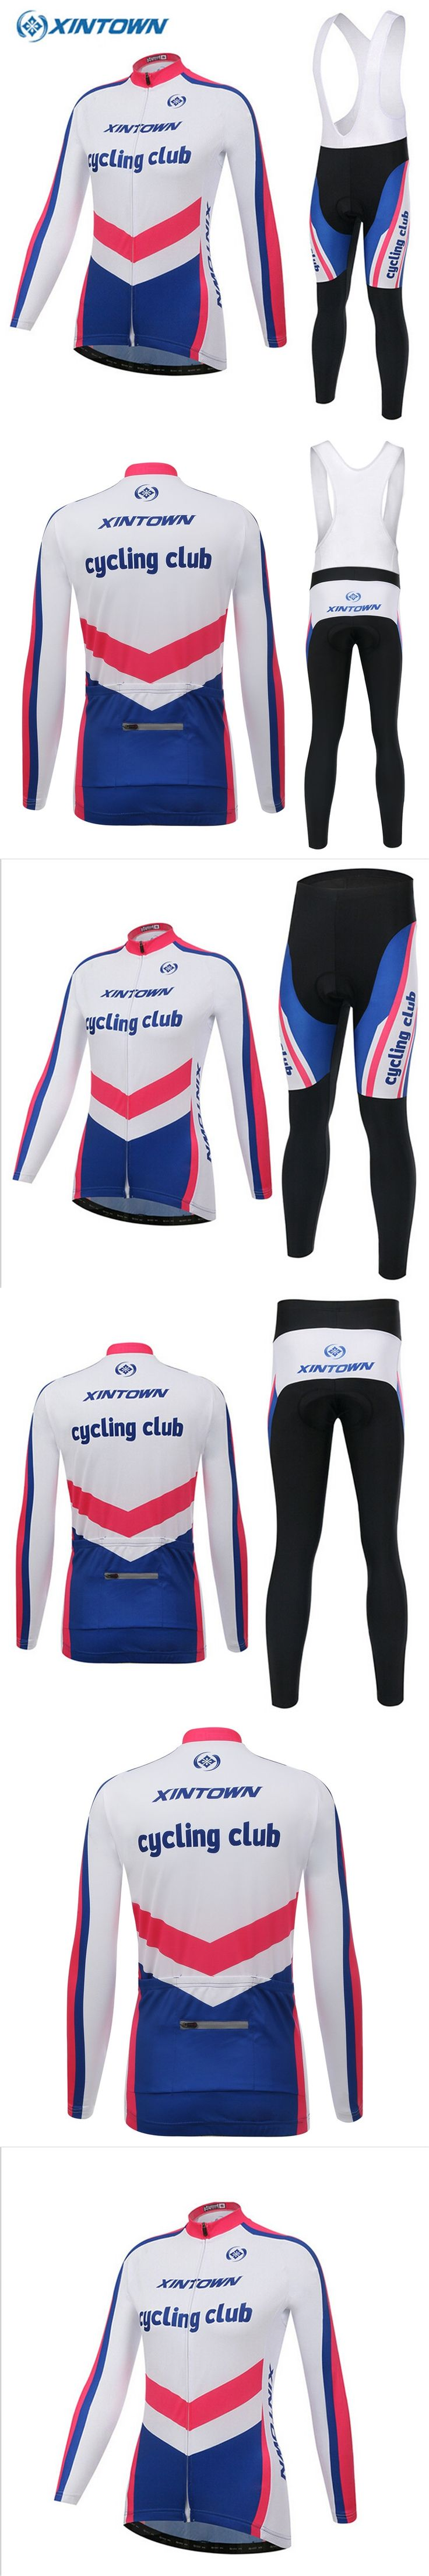 2017 Plus Size Women Long Sleeve Cycling Sport Clothing MTB Bike Bicycle Jersey Jacket Ciclismo Bicicleta Hot Sale